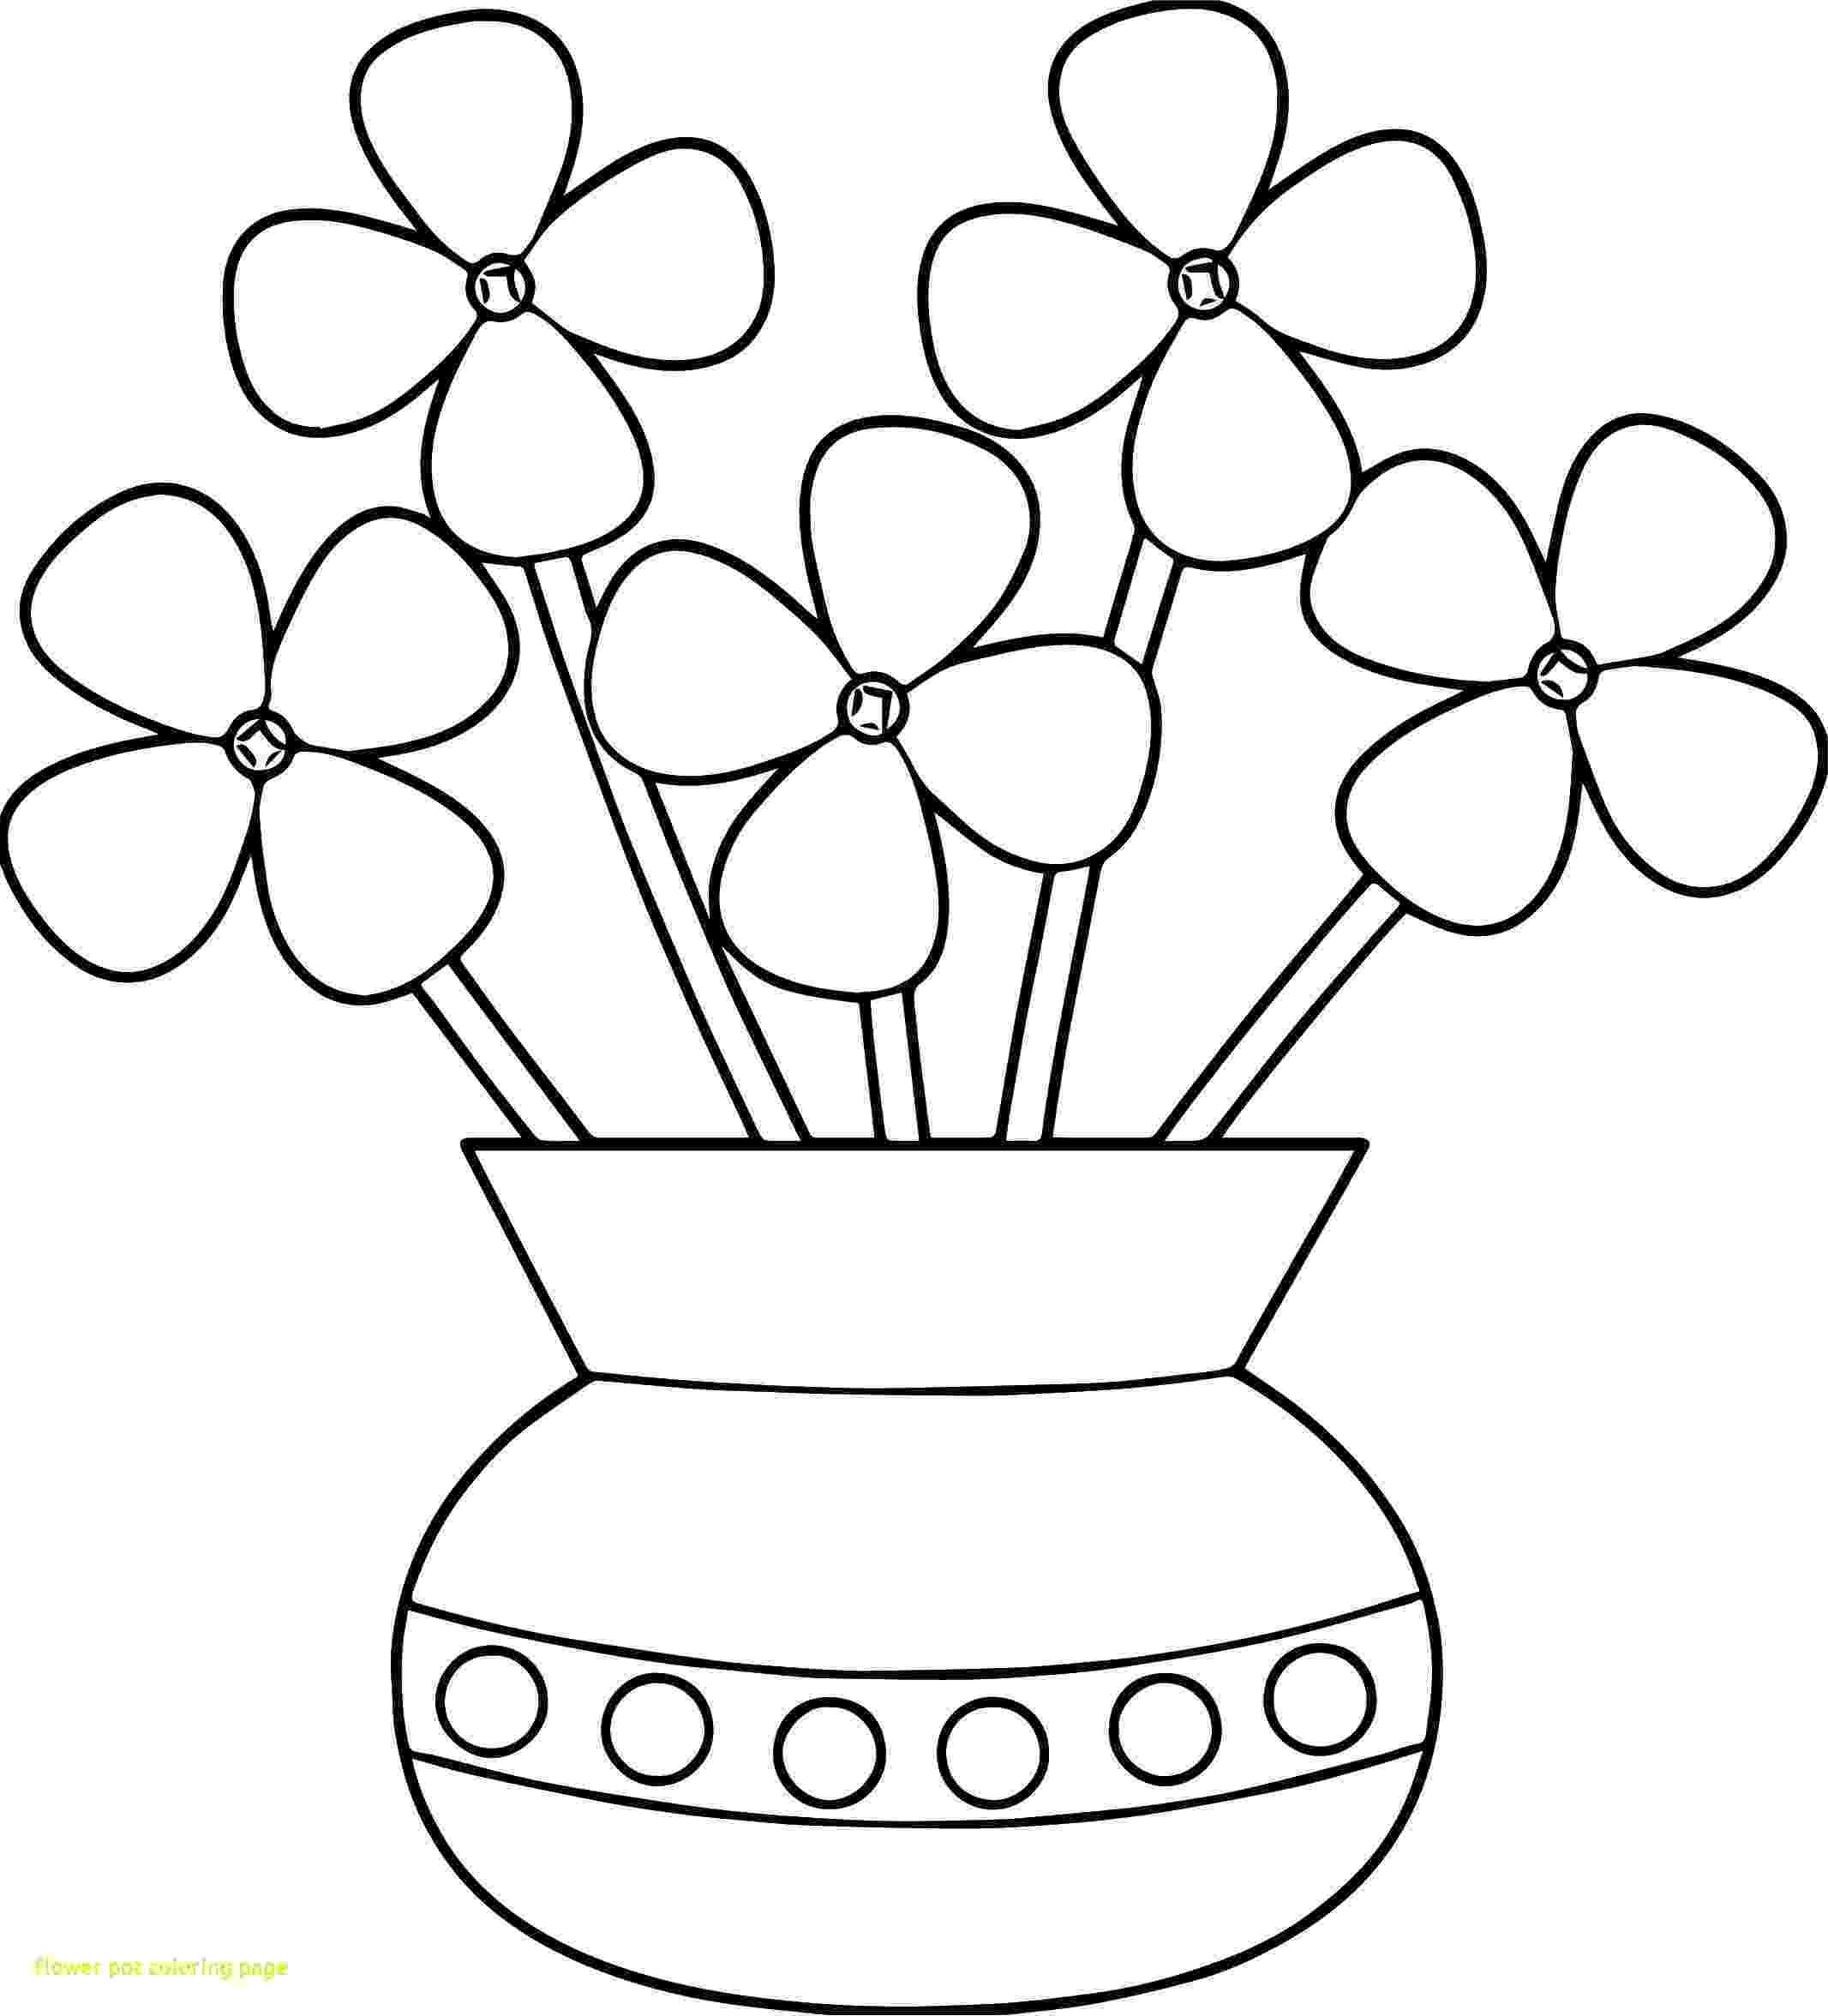 flower pot coloring page flower pot coloring printable page for kids 13 coloring page pot flower